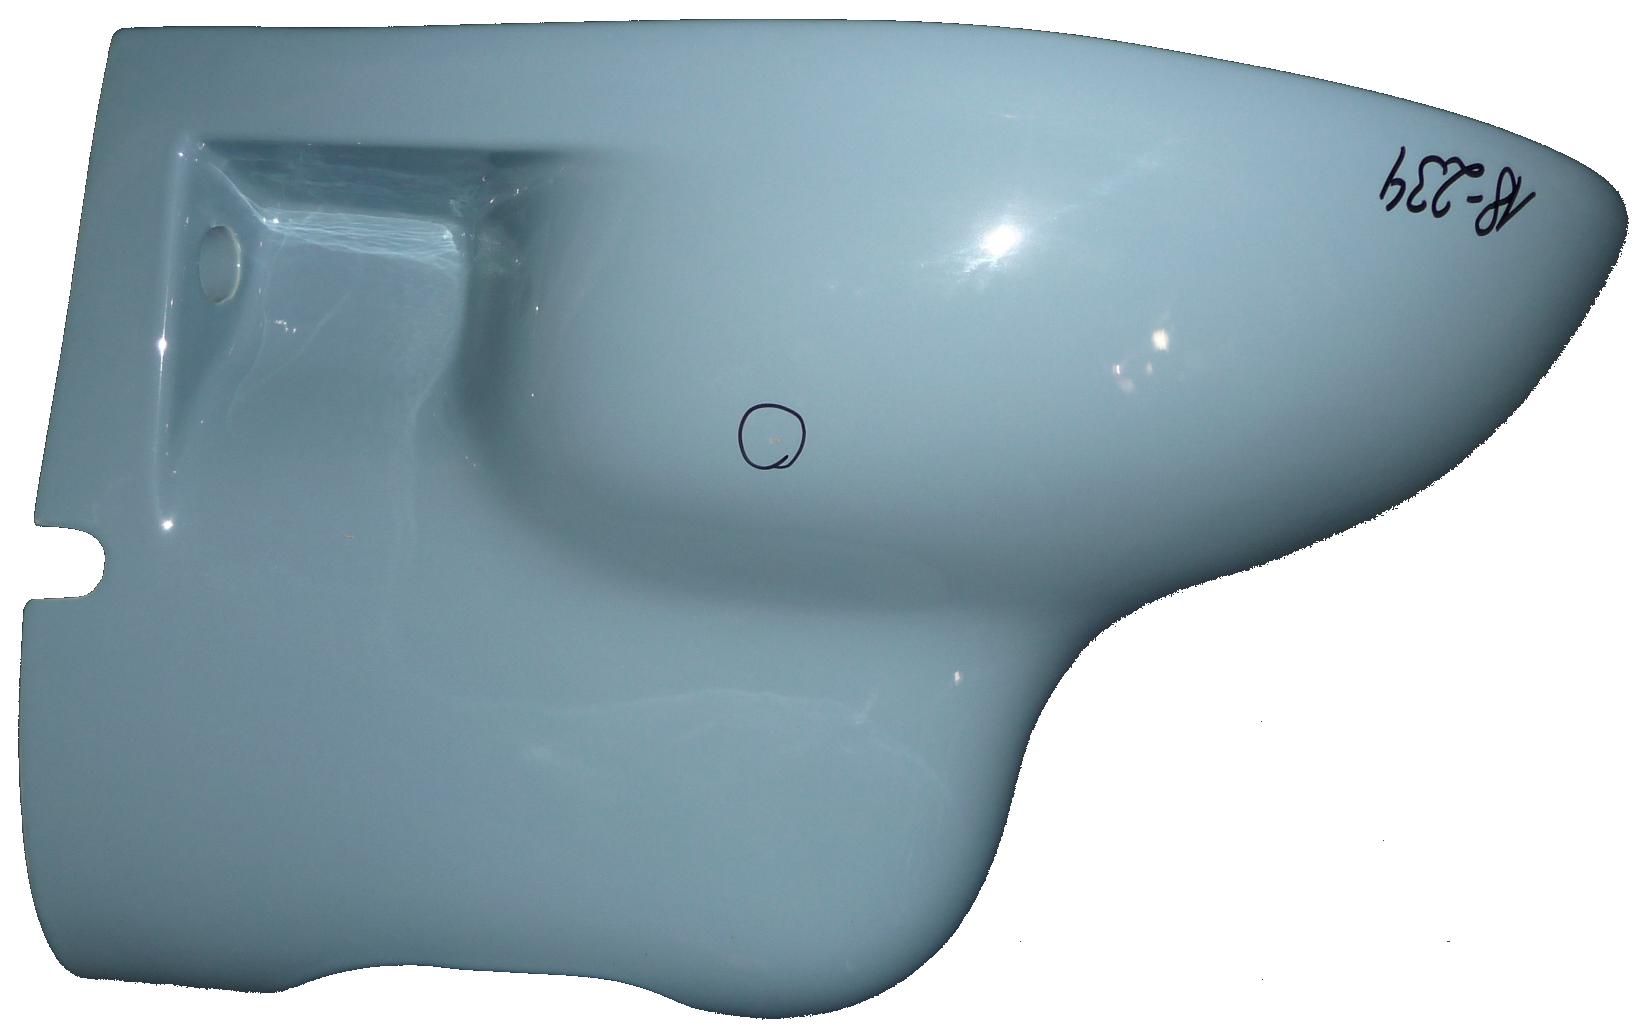 bermudablau Wand-Bidet 54x36 cm Warneton 1350 Bild 2